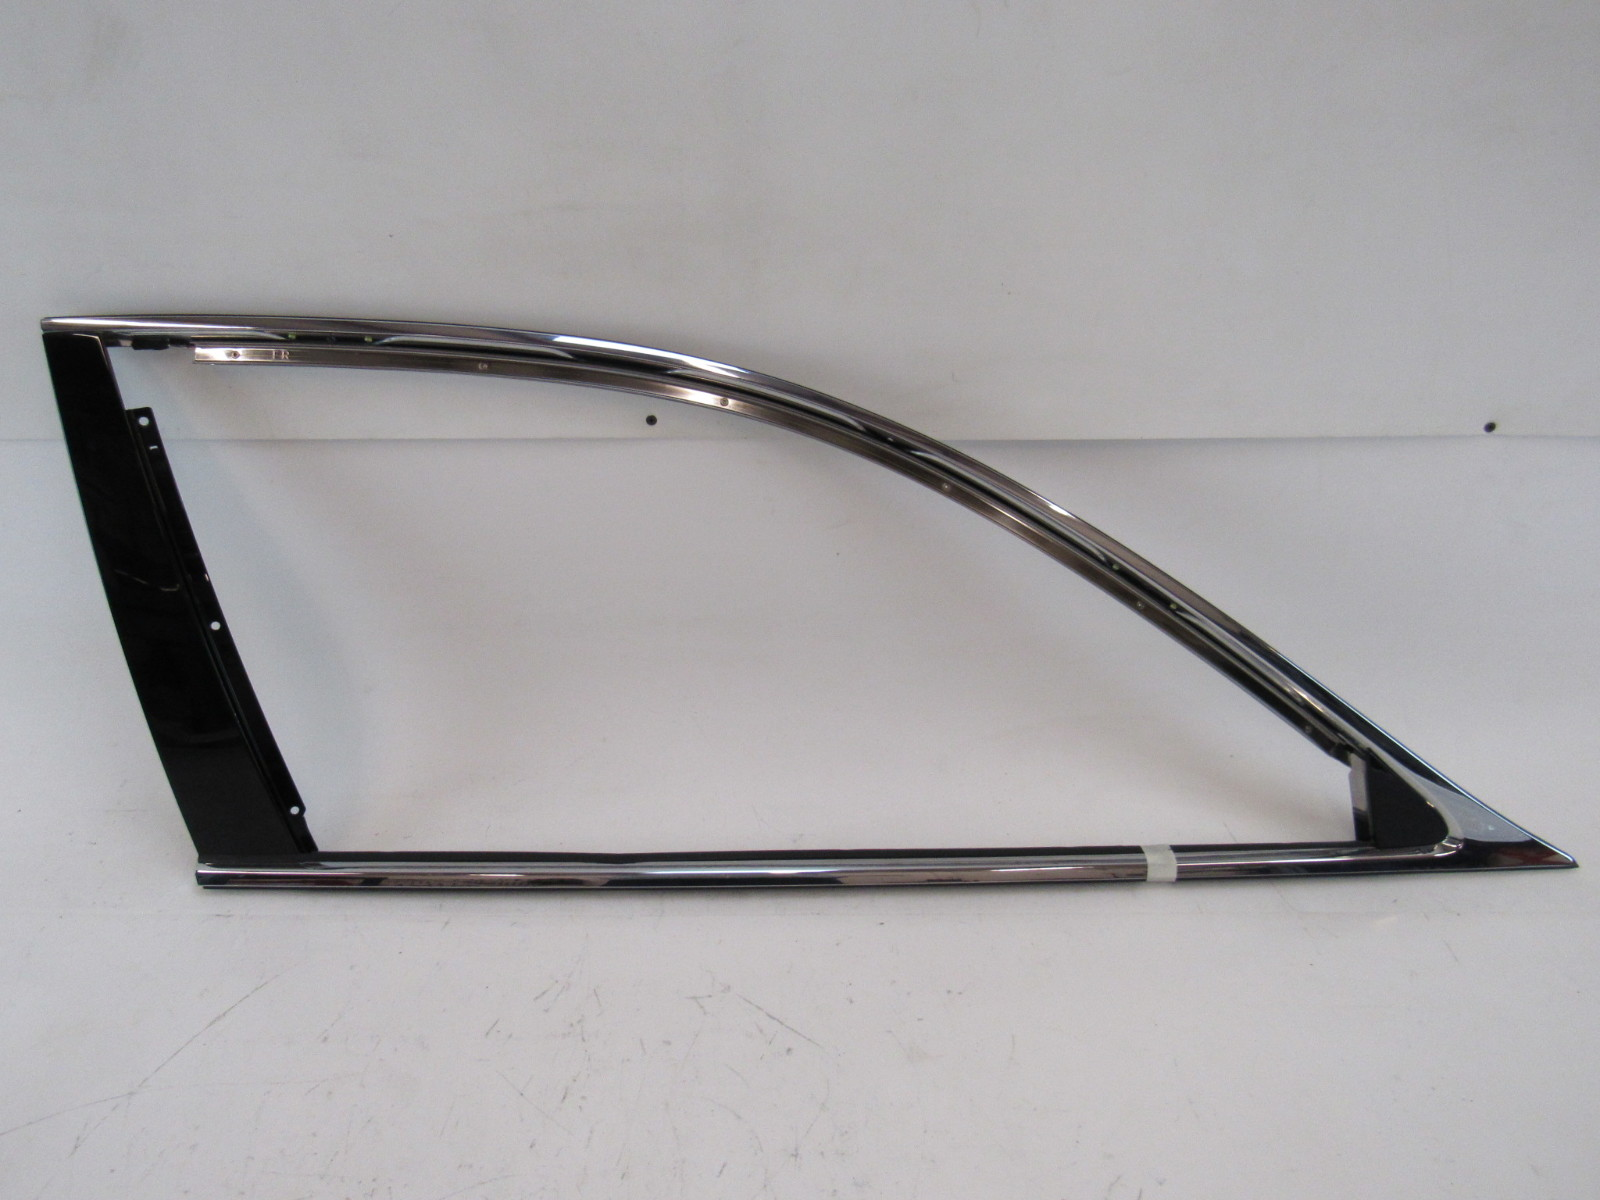 08 Lexus LS460 LS460L trim, door moulding, window surround, right front | S  Auto Parts